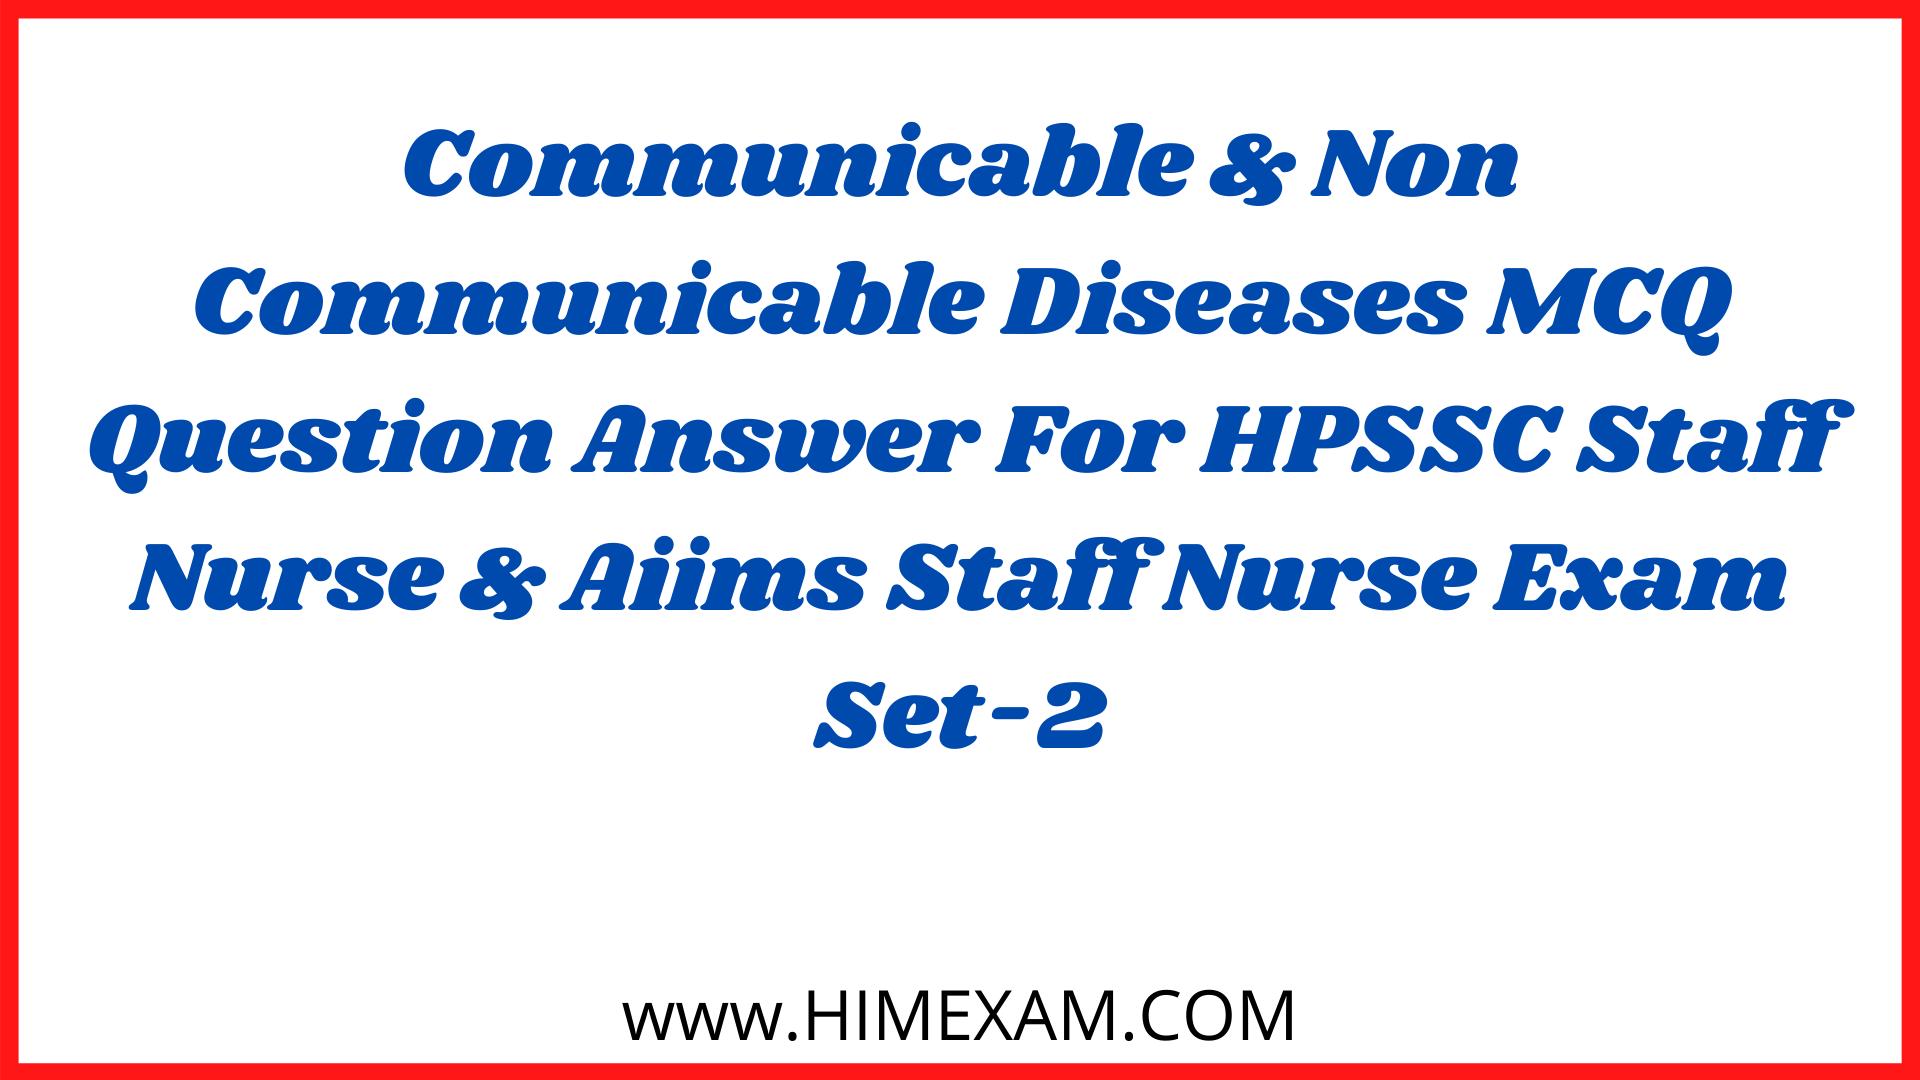 Communicable & Non Communicable Diseases MCQ Question Answer For HPSSC Staff Nurse & Aiims Staff Nurse Exam Set-2